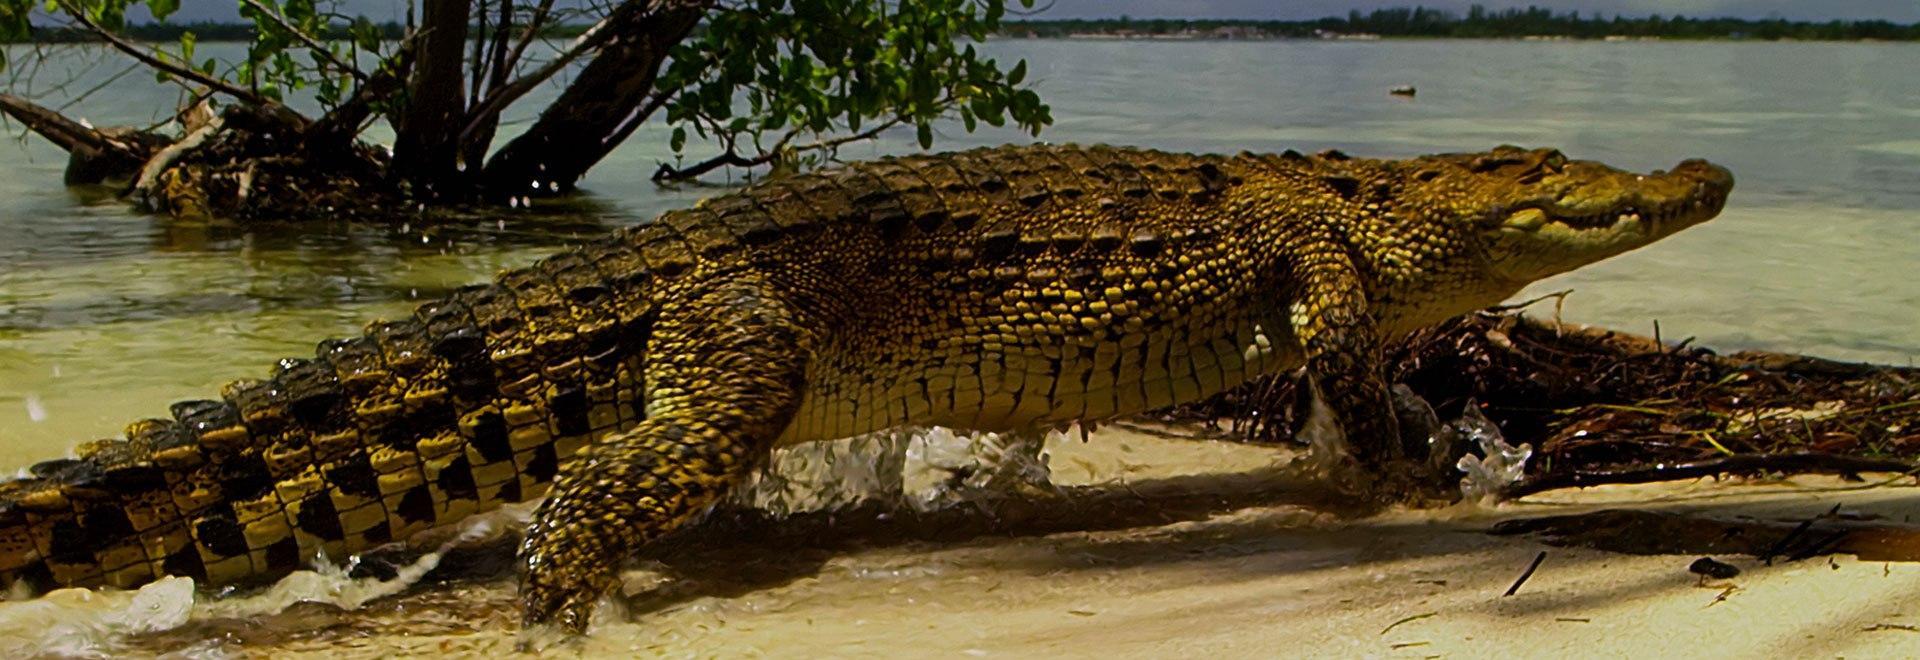 Wild Caraibi